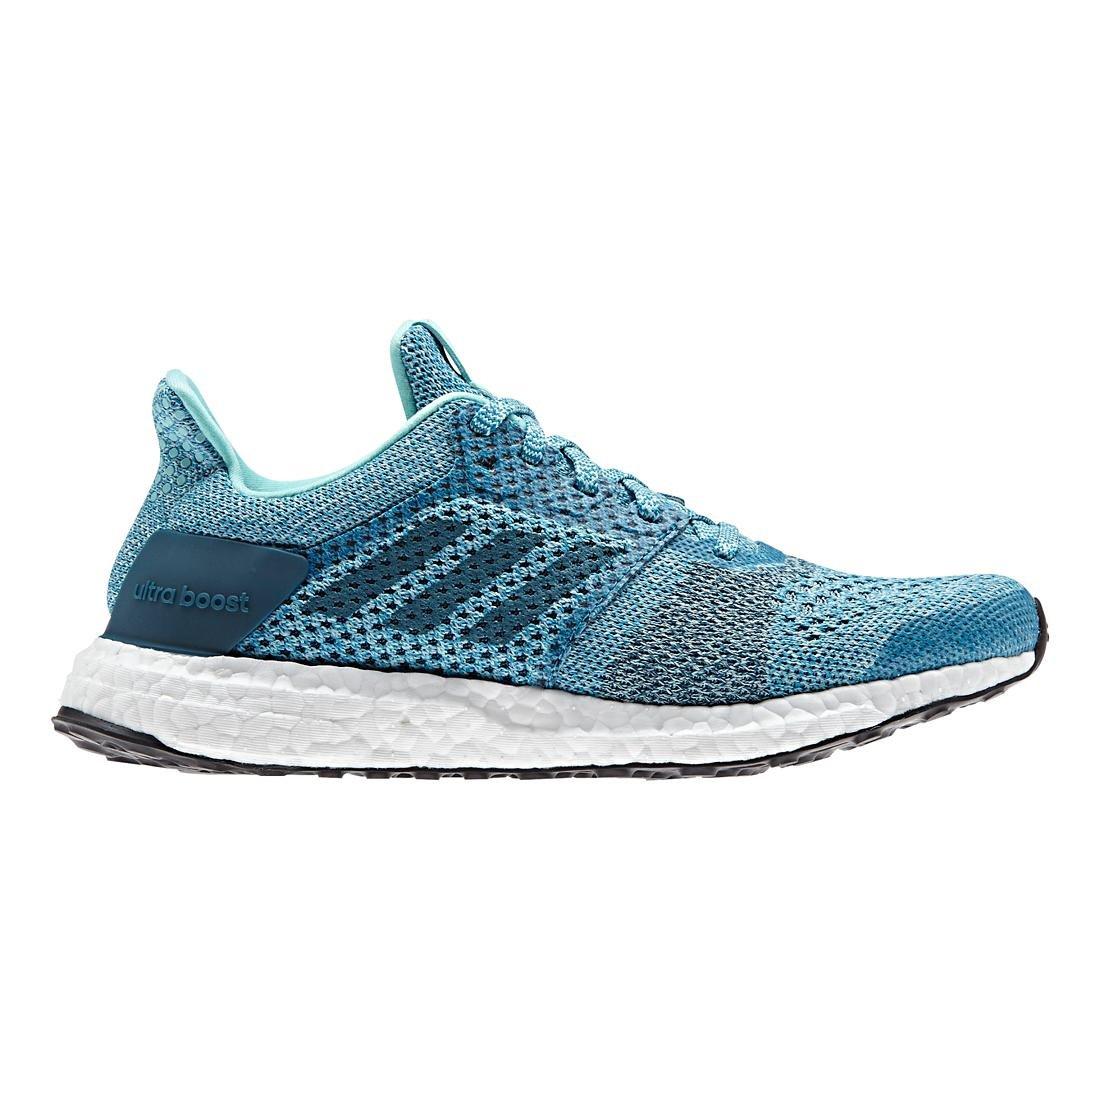 adidas Women's Ultraboost St Parley Running Shoe B072F3GKHG 10.5 B(M) US|Aqua/Silver